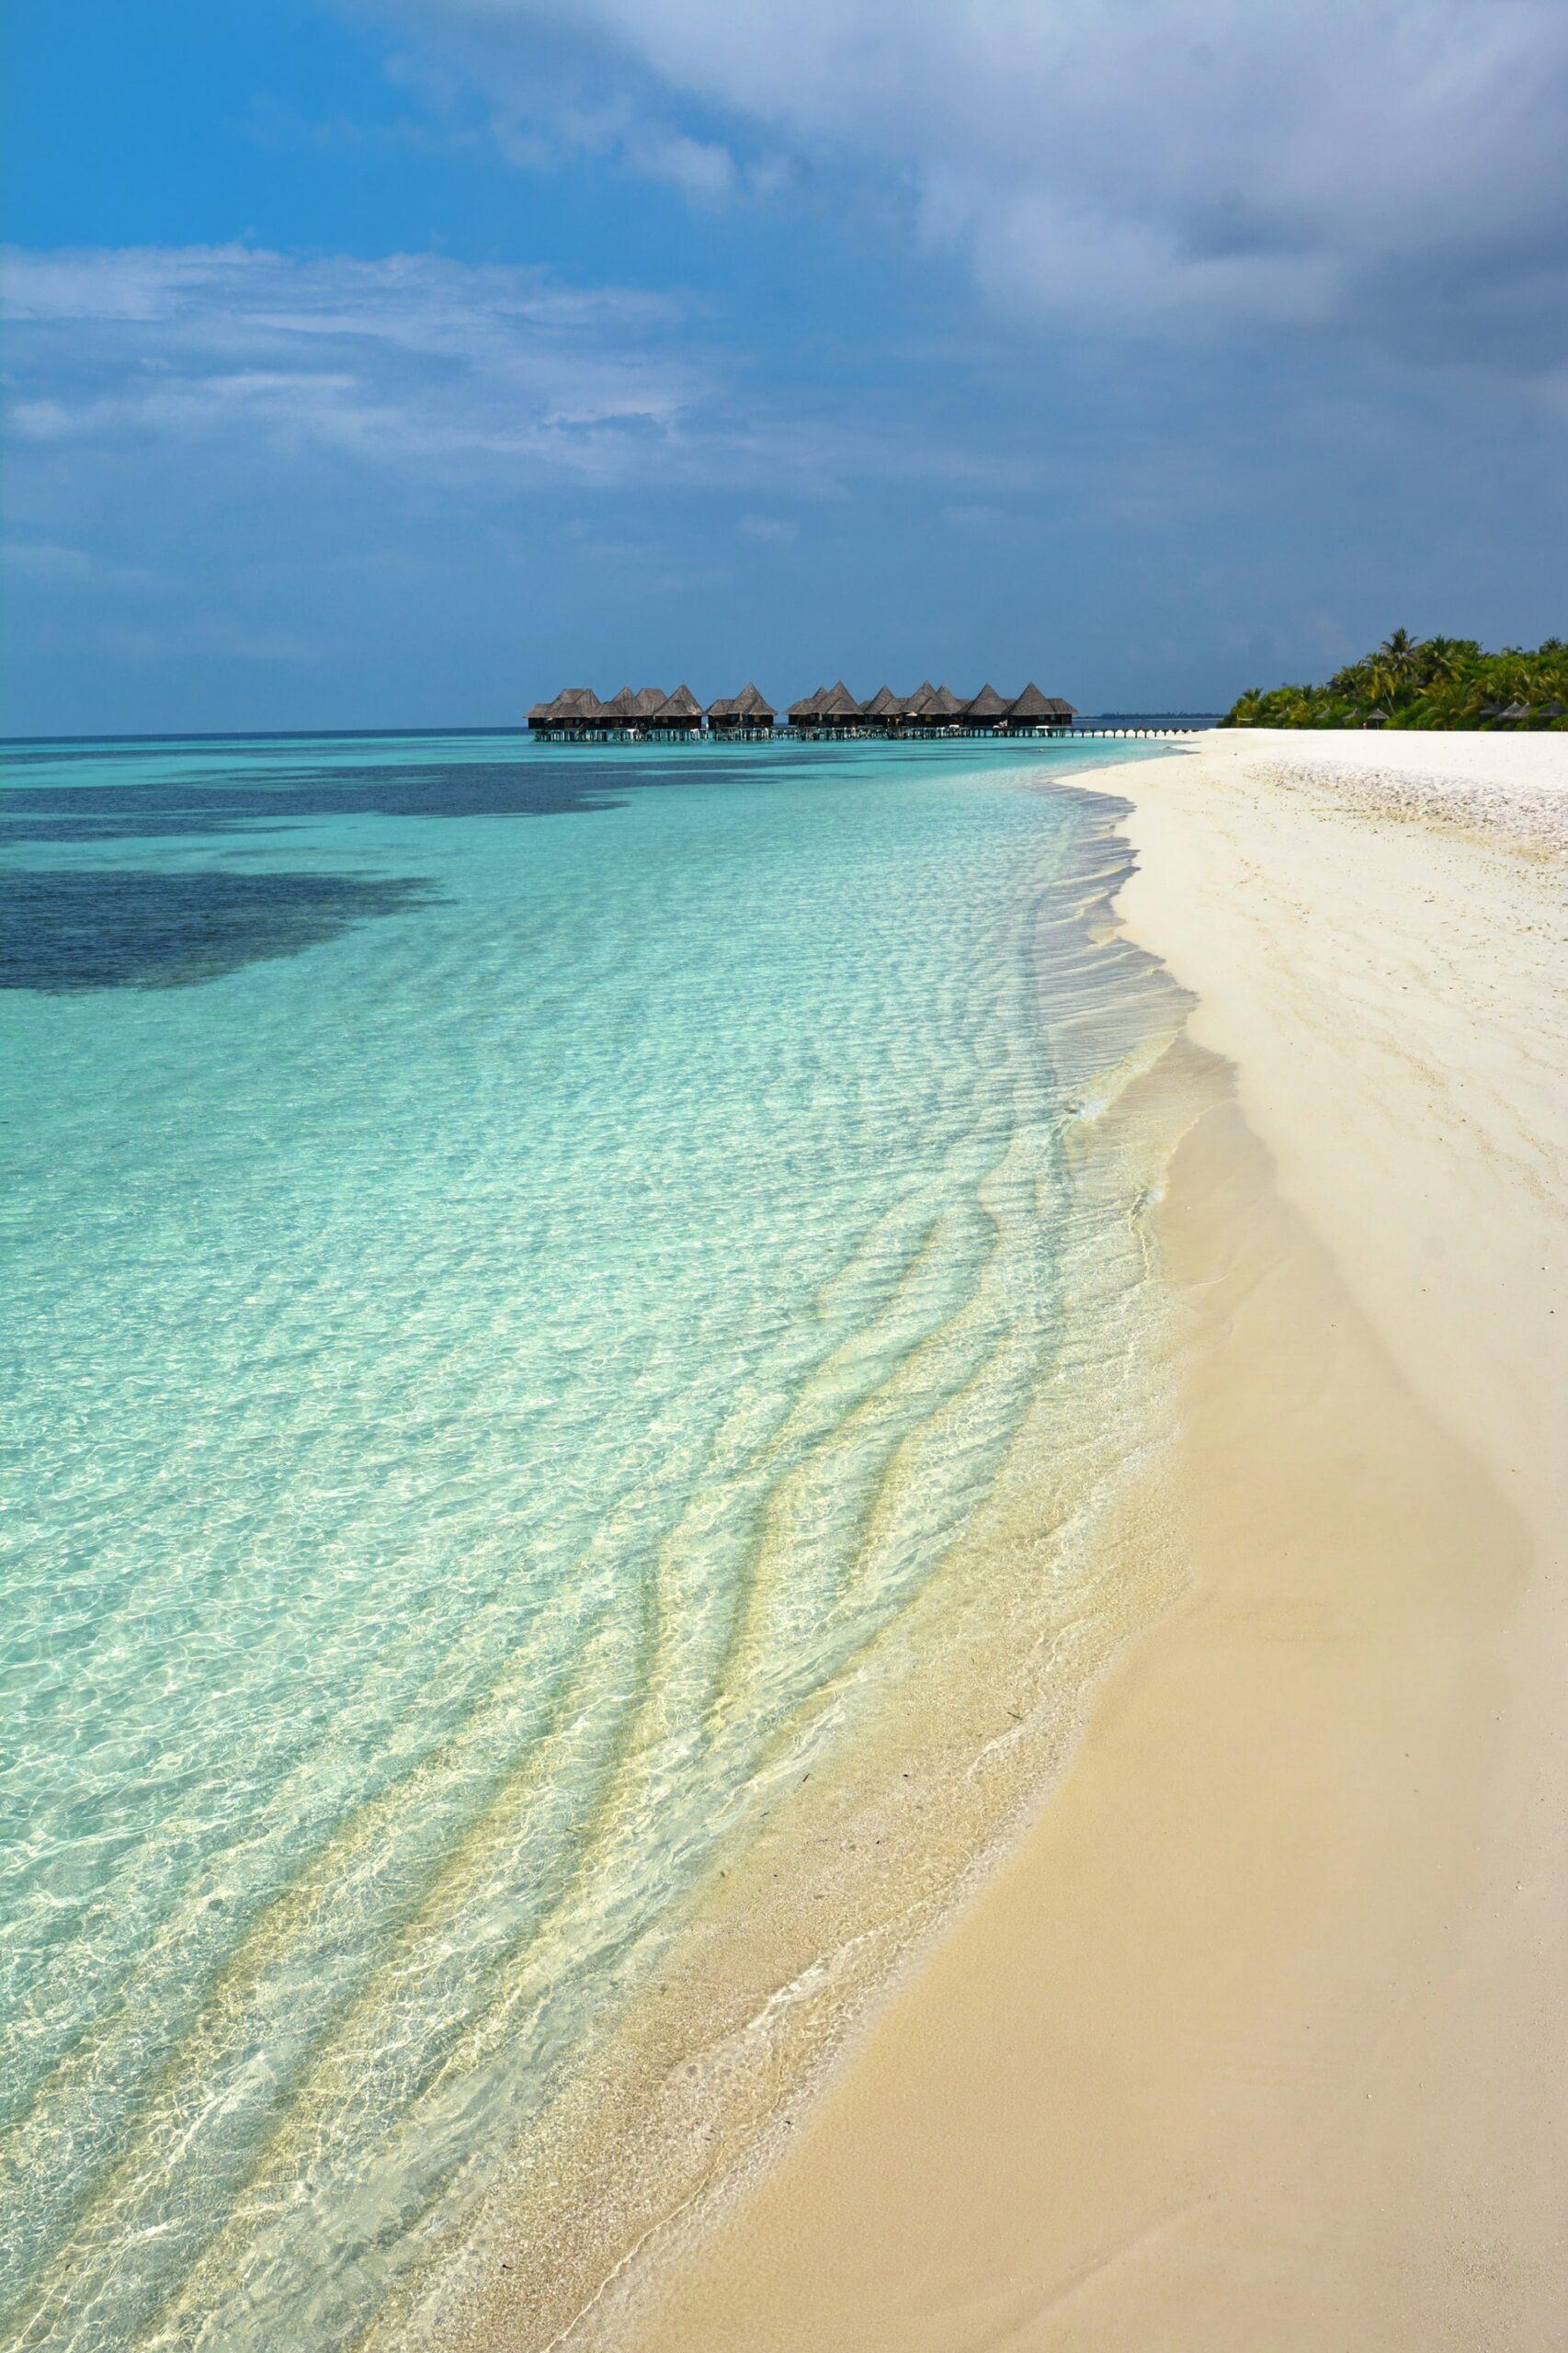 Cocos-Inseln Steckbrief – Name, Geografie, Klima